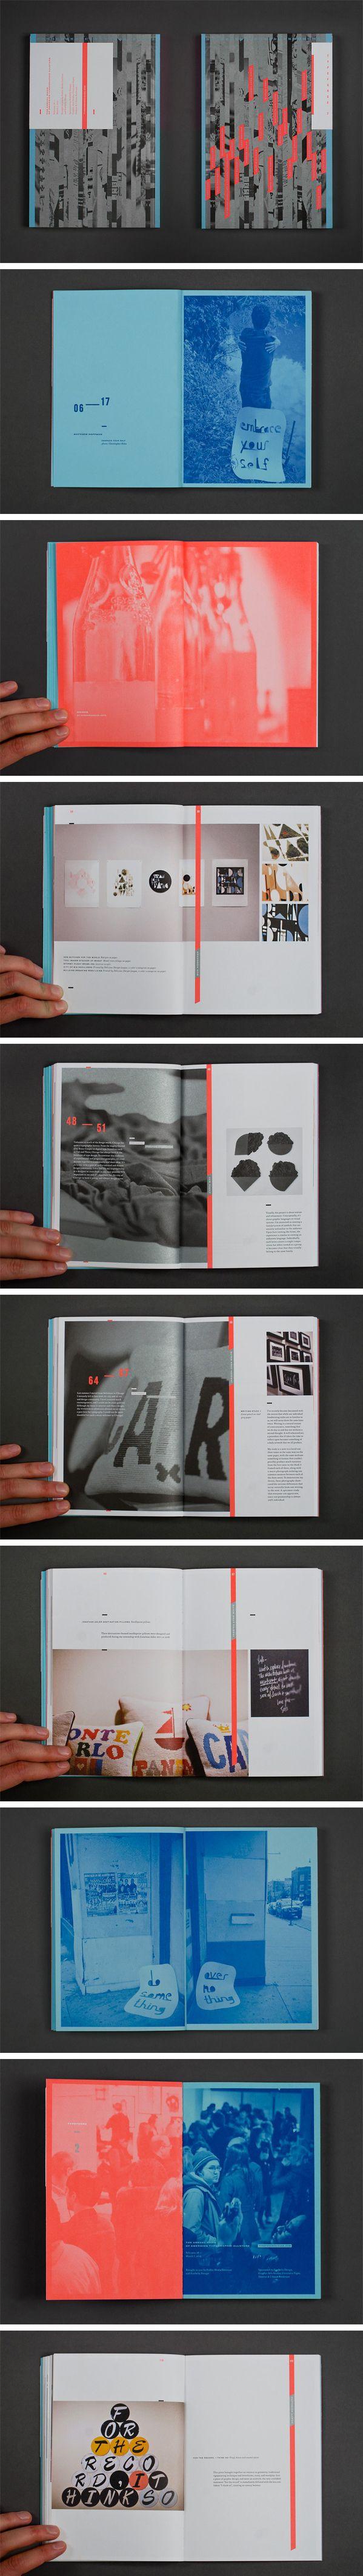 /// Typeforce 2 Exhibition Catalogue